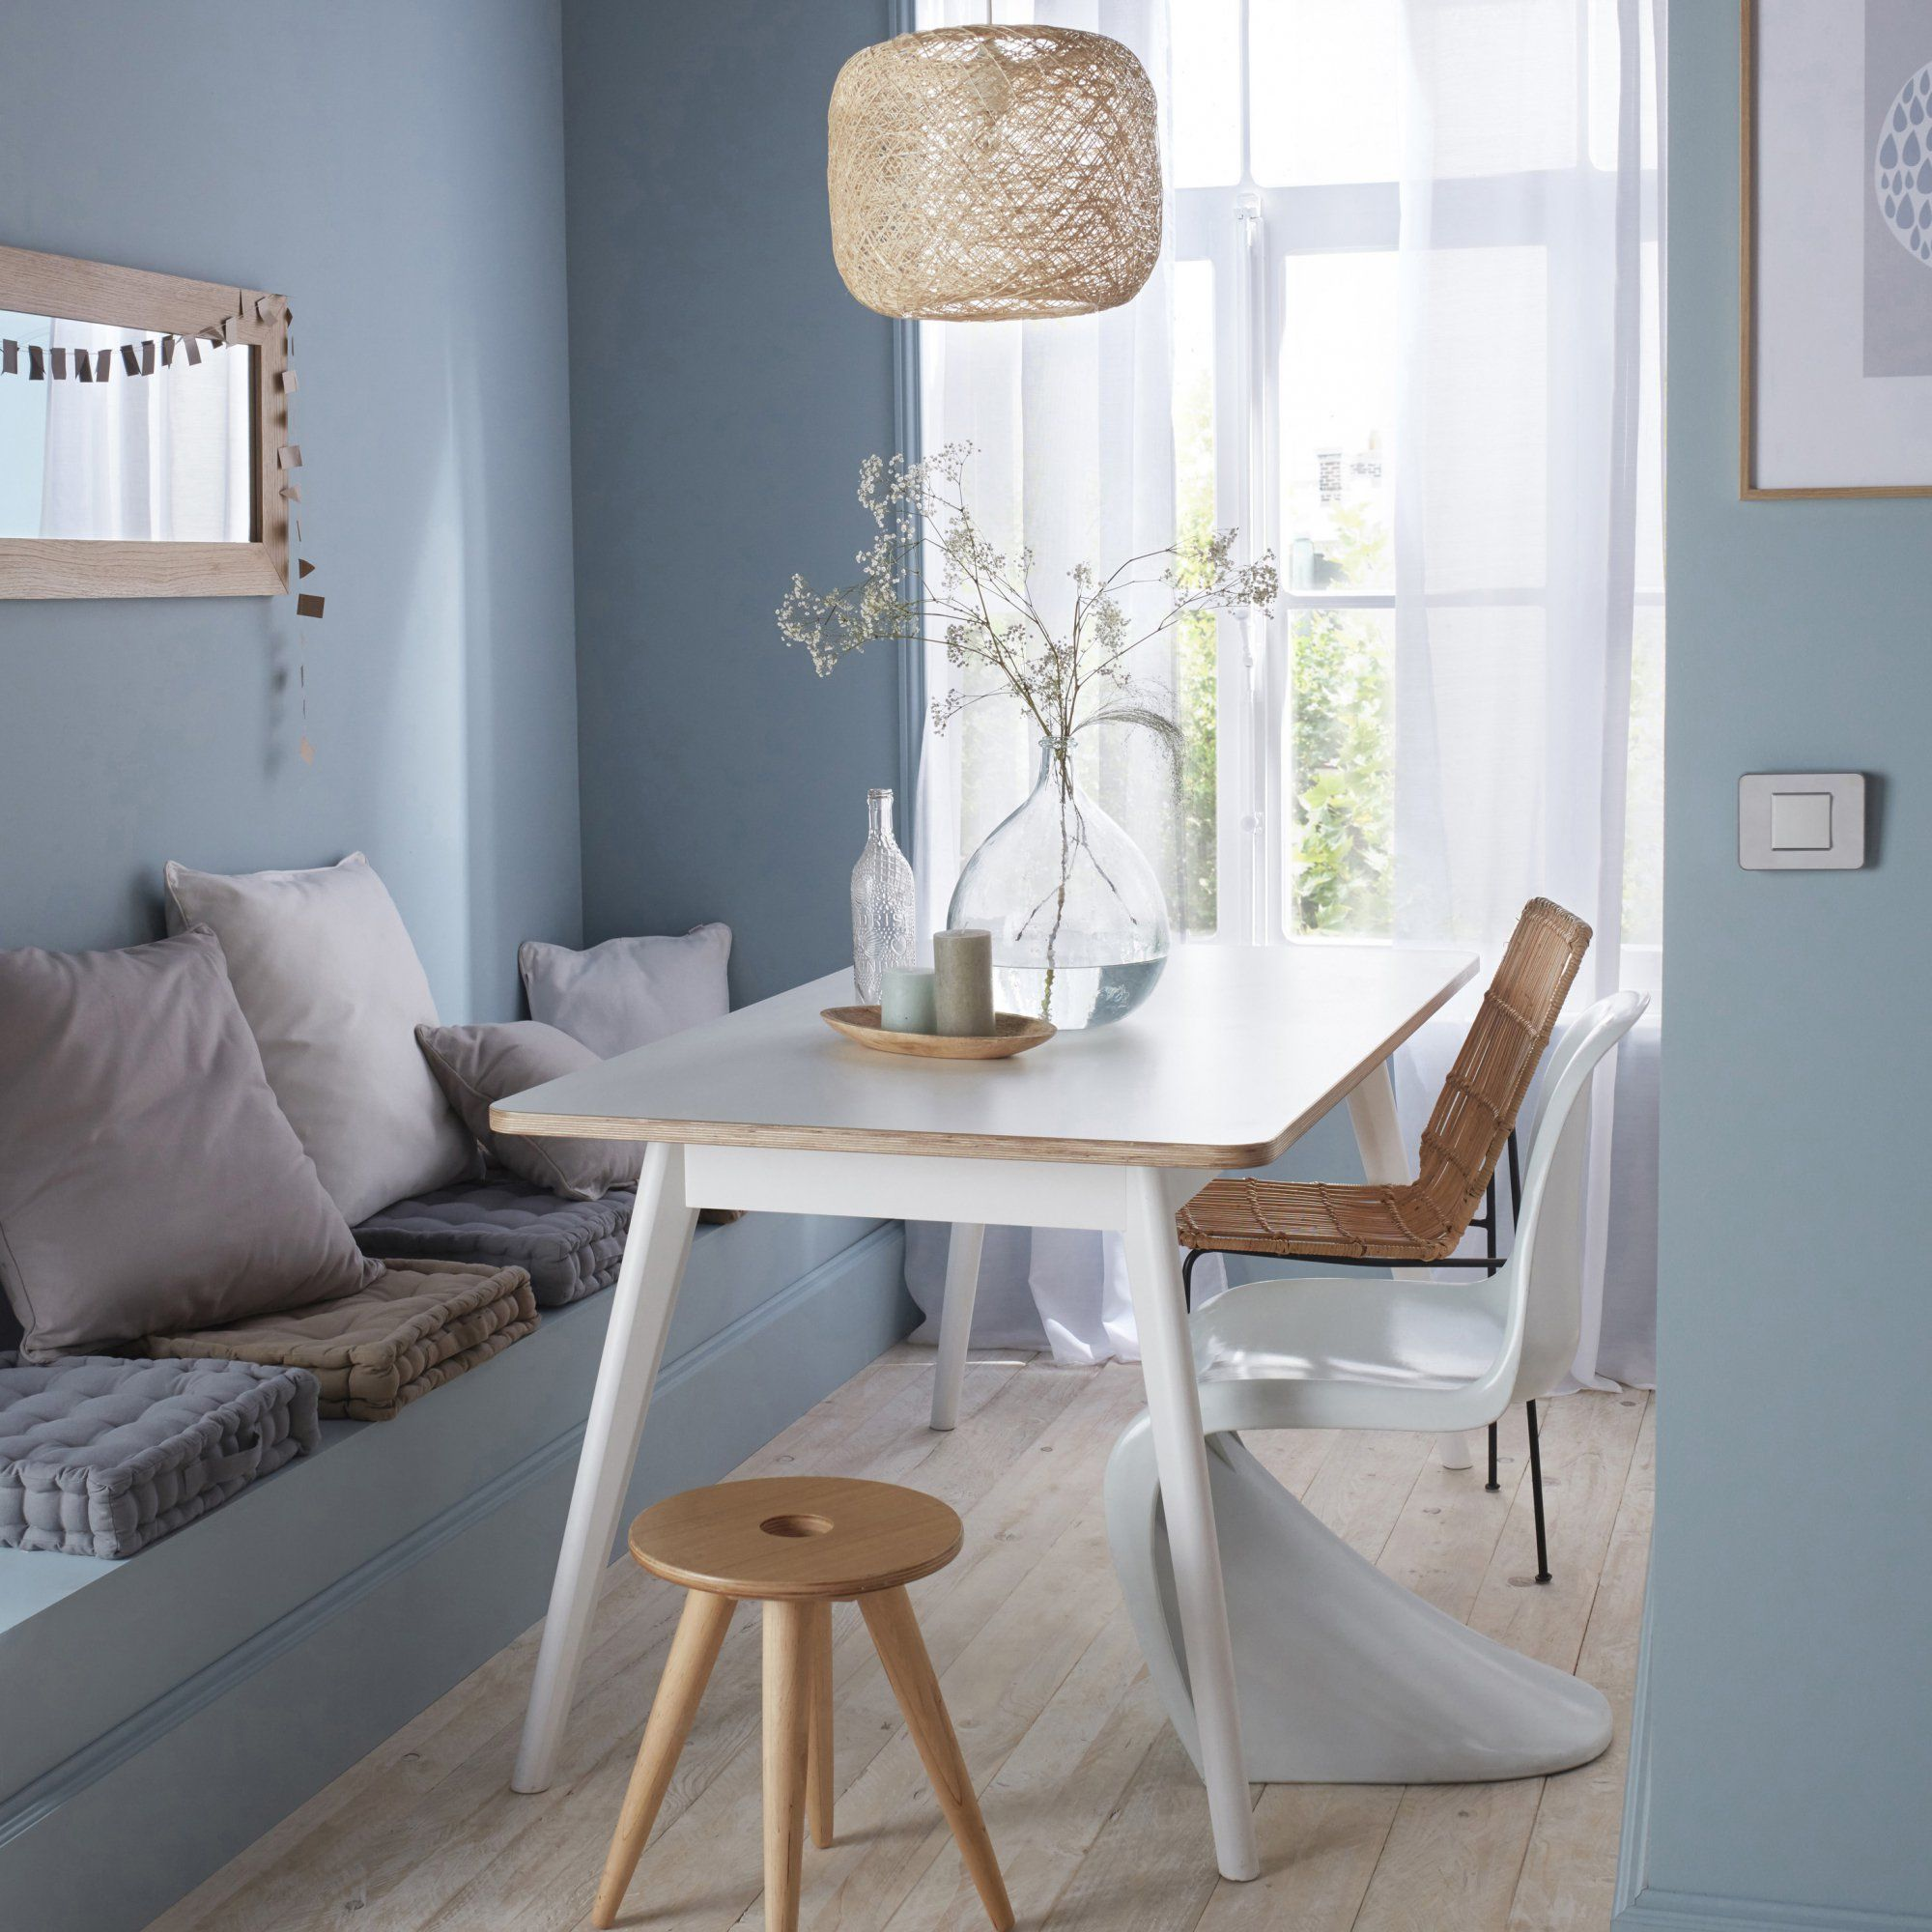 banquette table a manger best archer dining table dining. Black Bedroom Furniture Sets. Home Design Ideas